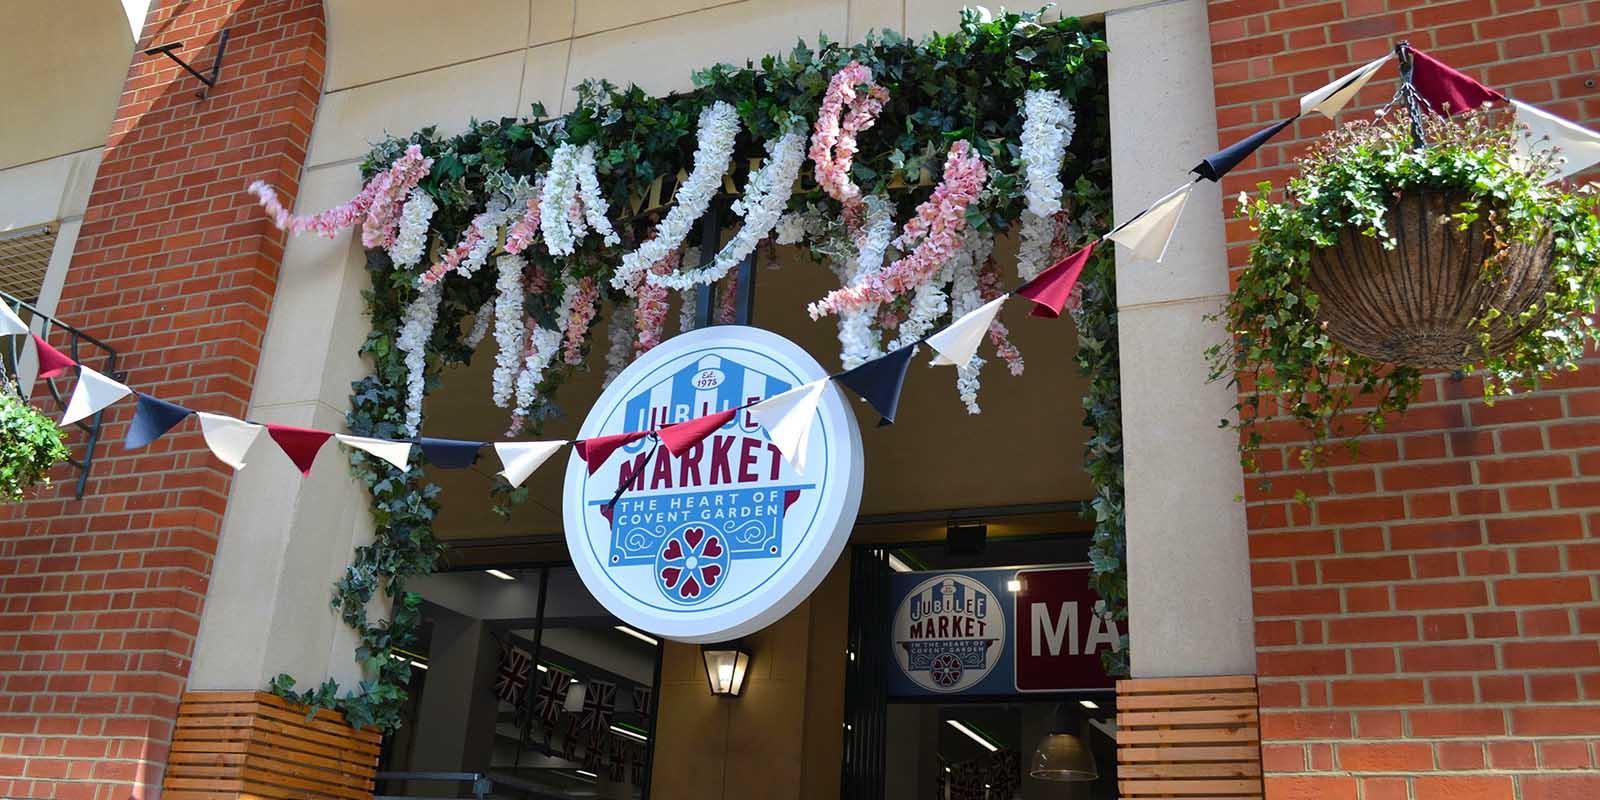 covent garden market in london ☆ shopping, essen